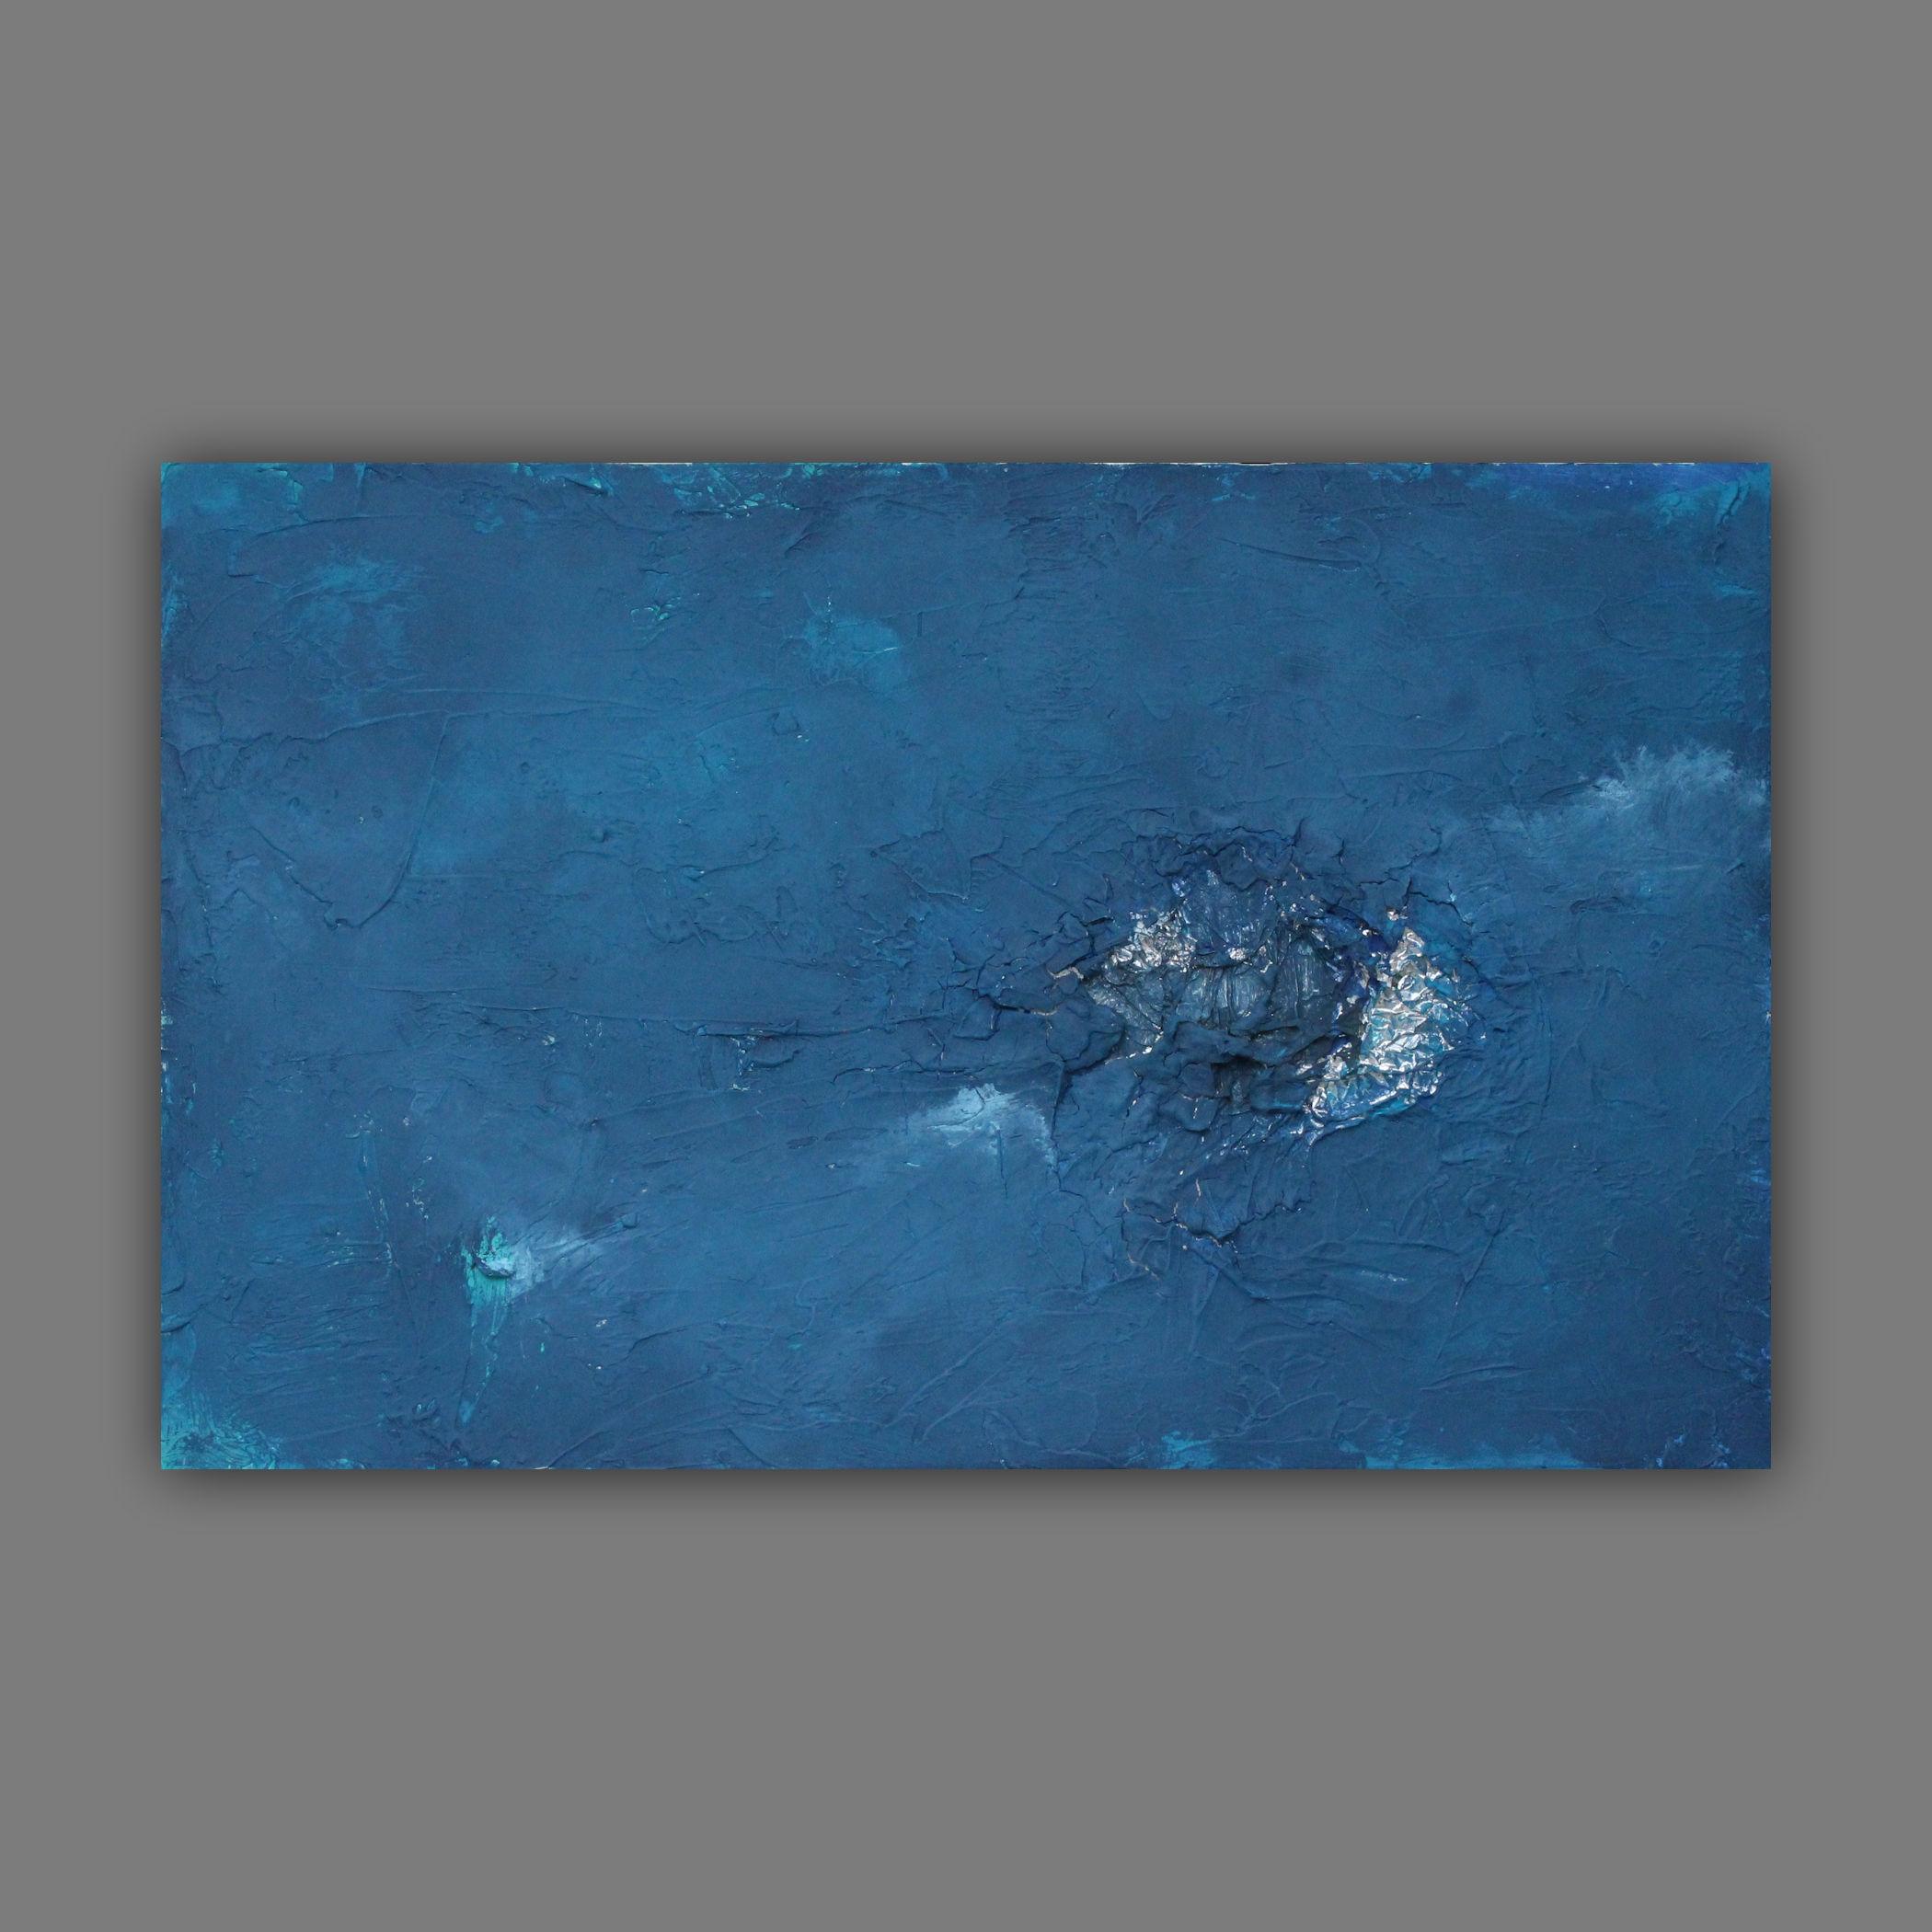 Untitled Commission, 2018